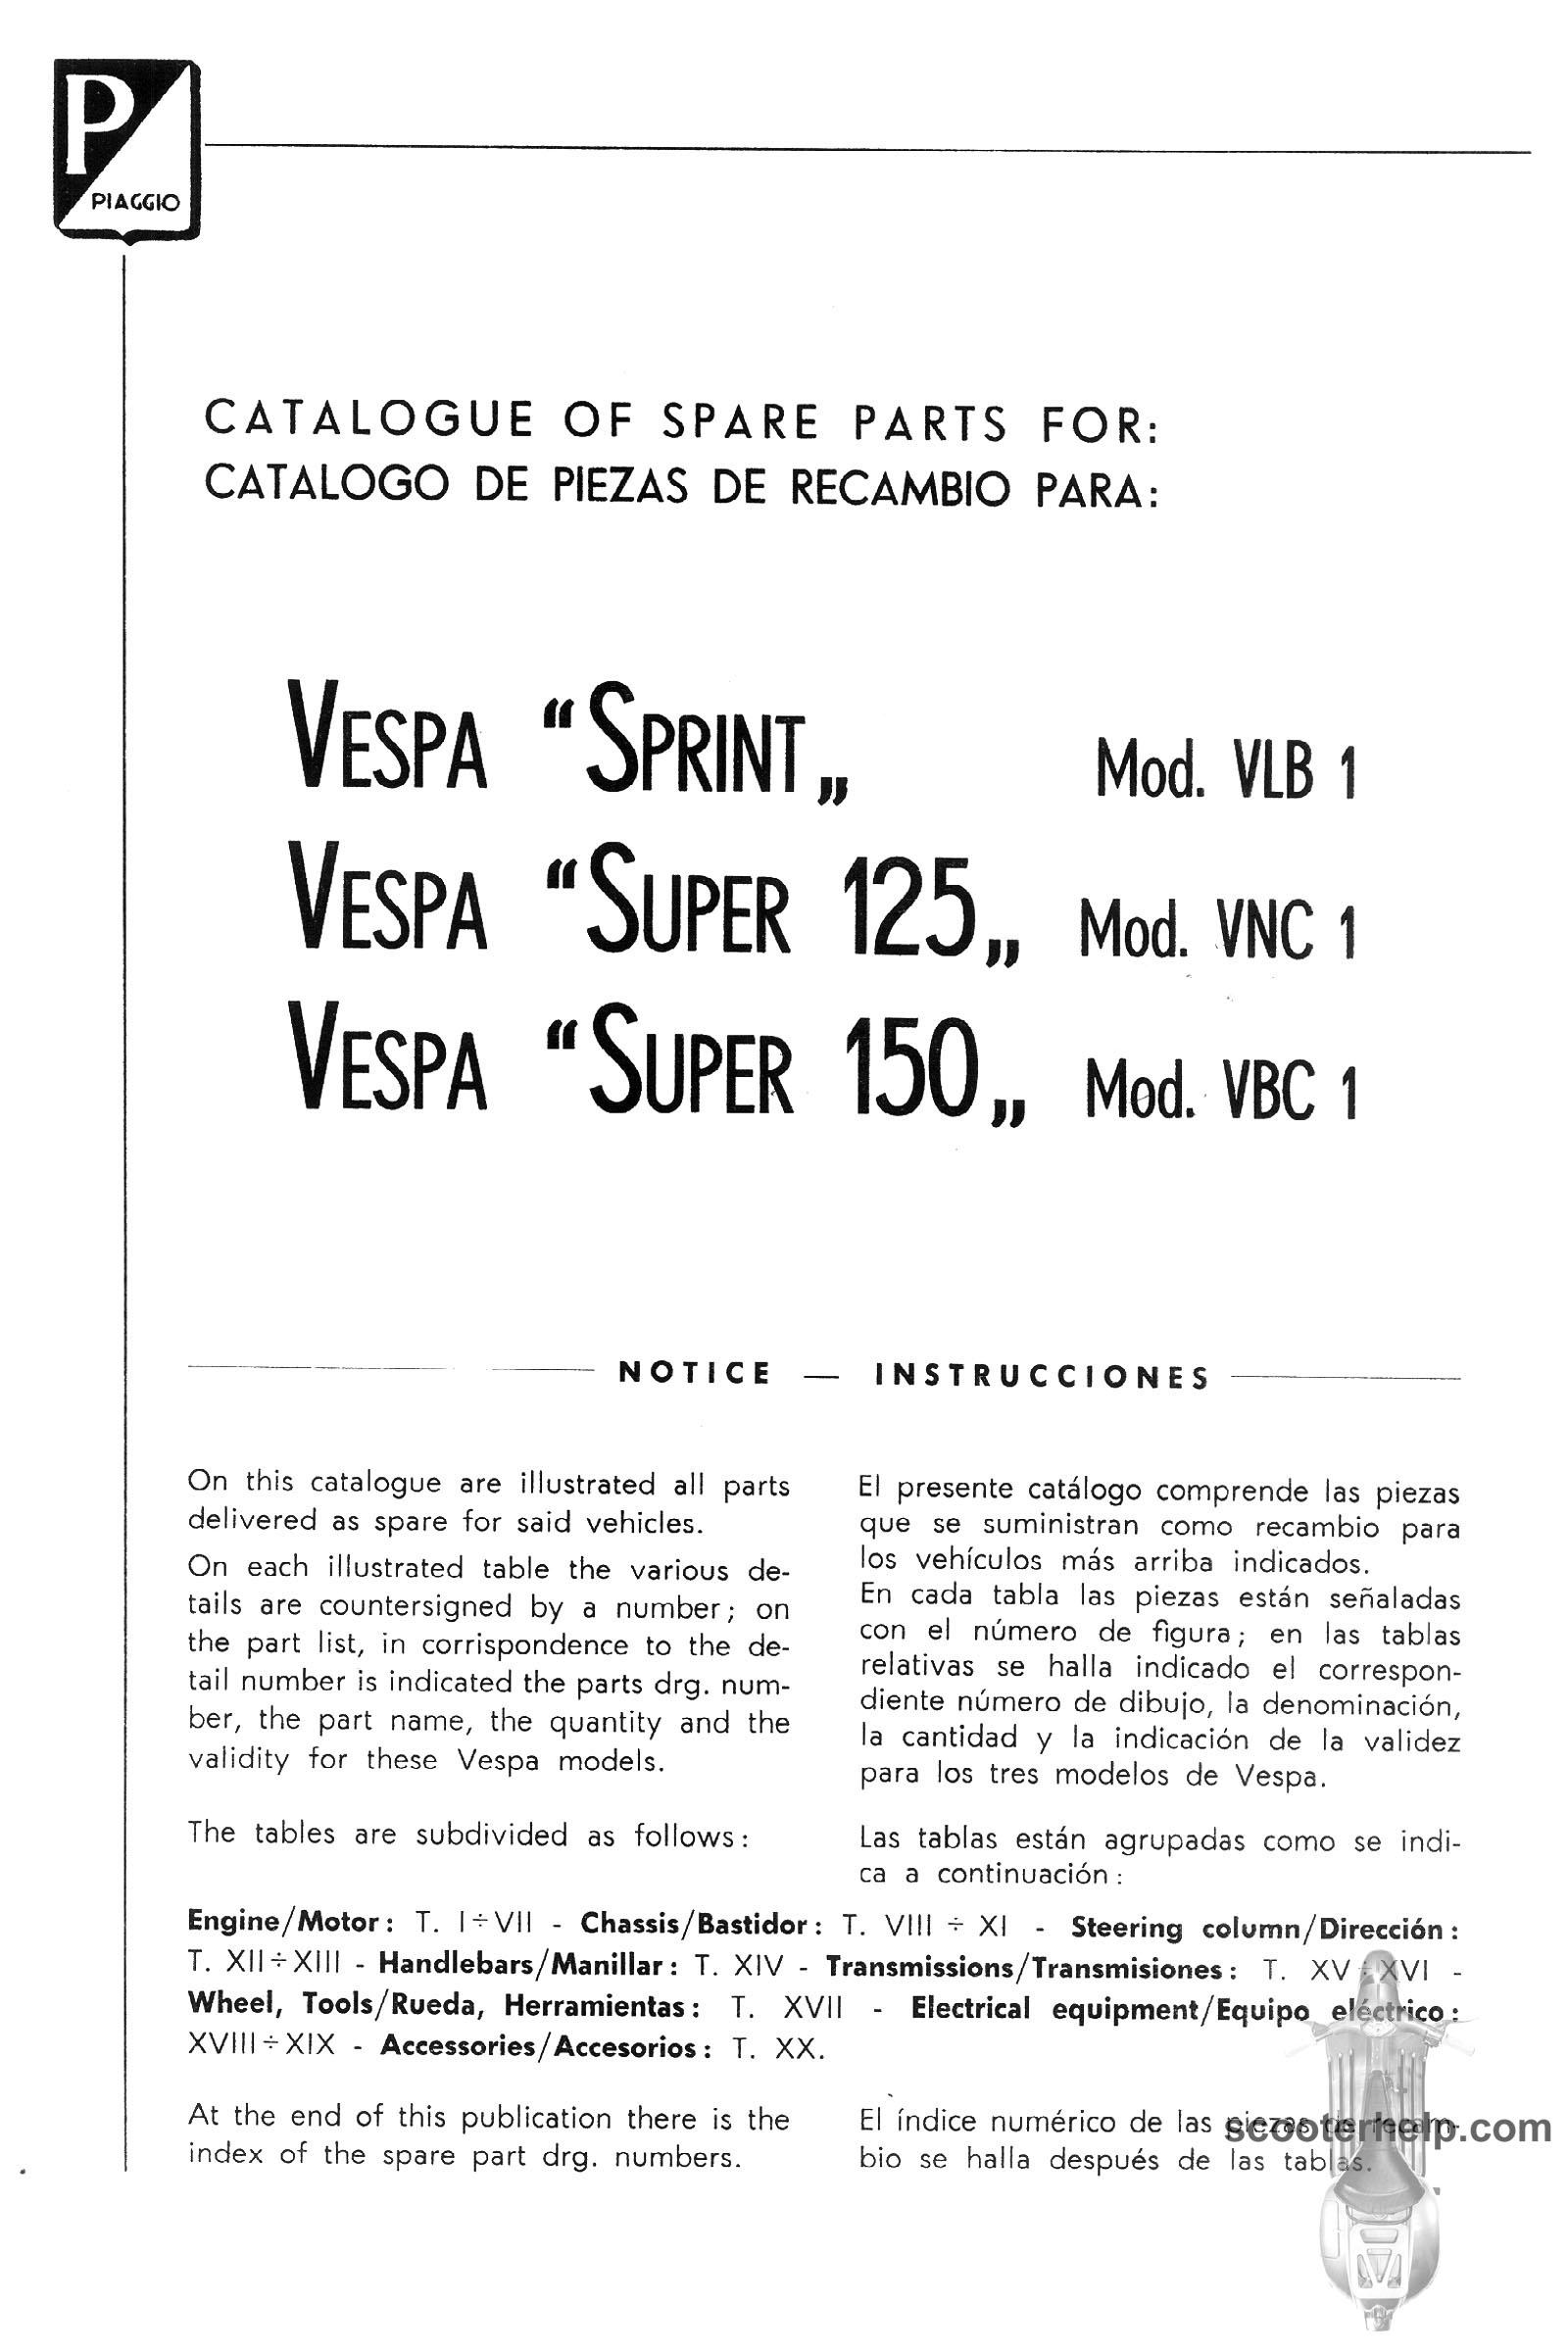 Vermeer Sc252 Parts List Wiring Harness Stump Grinder Array Wireshark Bits Espa Ol Wire Center U Bigshopgo Bobcat Manual